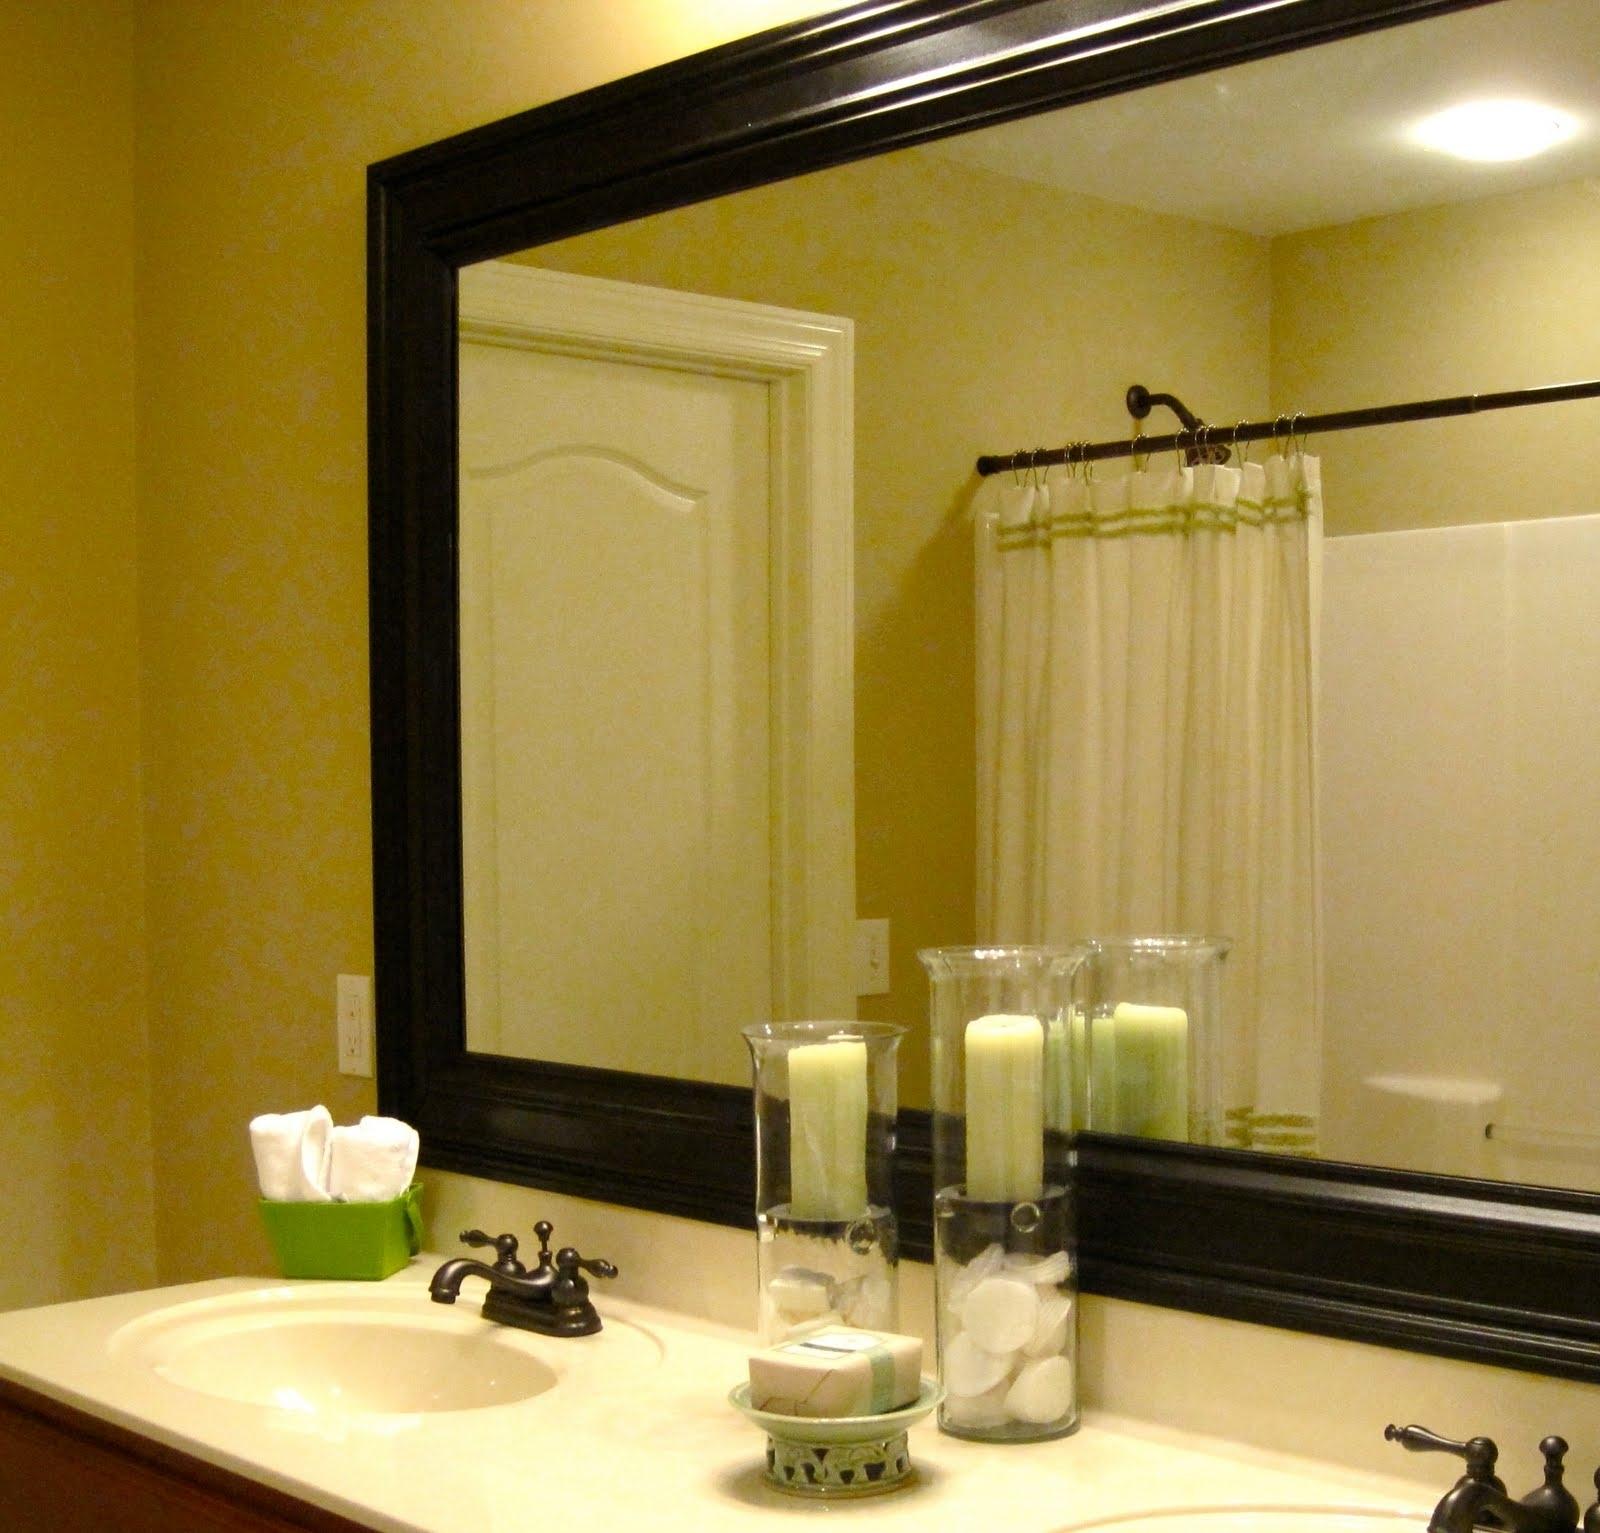 Bathroom Elegant Bathroom Decor With Large Framed Bathroom Within Venetian Bathroom Mirror (Image 4 of 15)